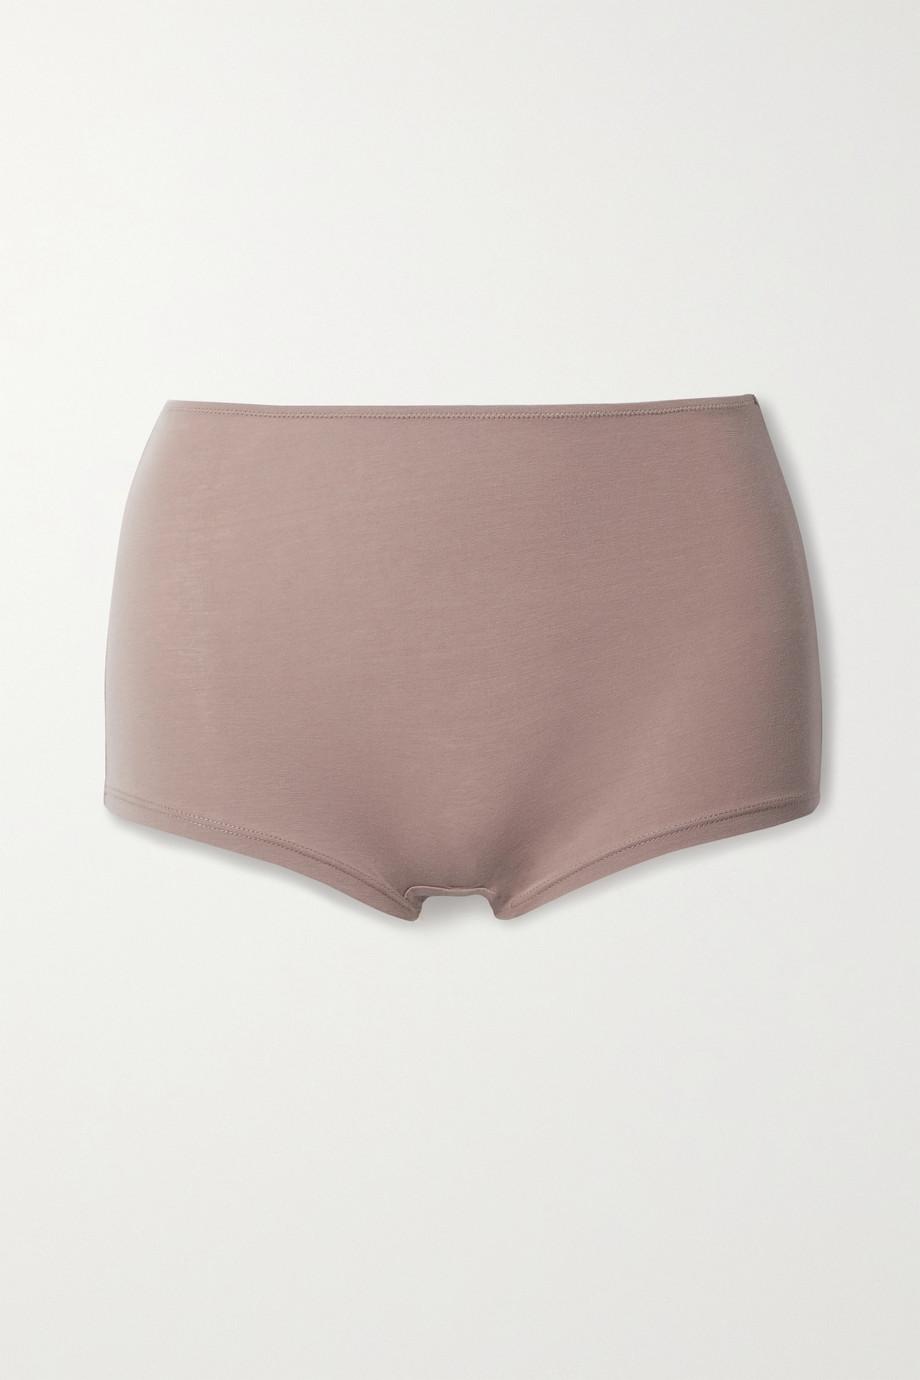 Skin 【NET SUSTAIN】Gayle 弹力有机比马棉质平纹布三角裤